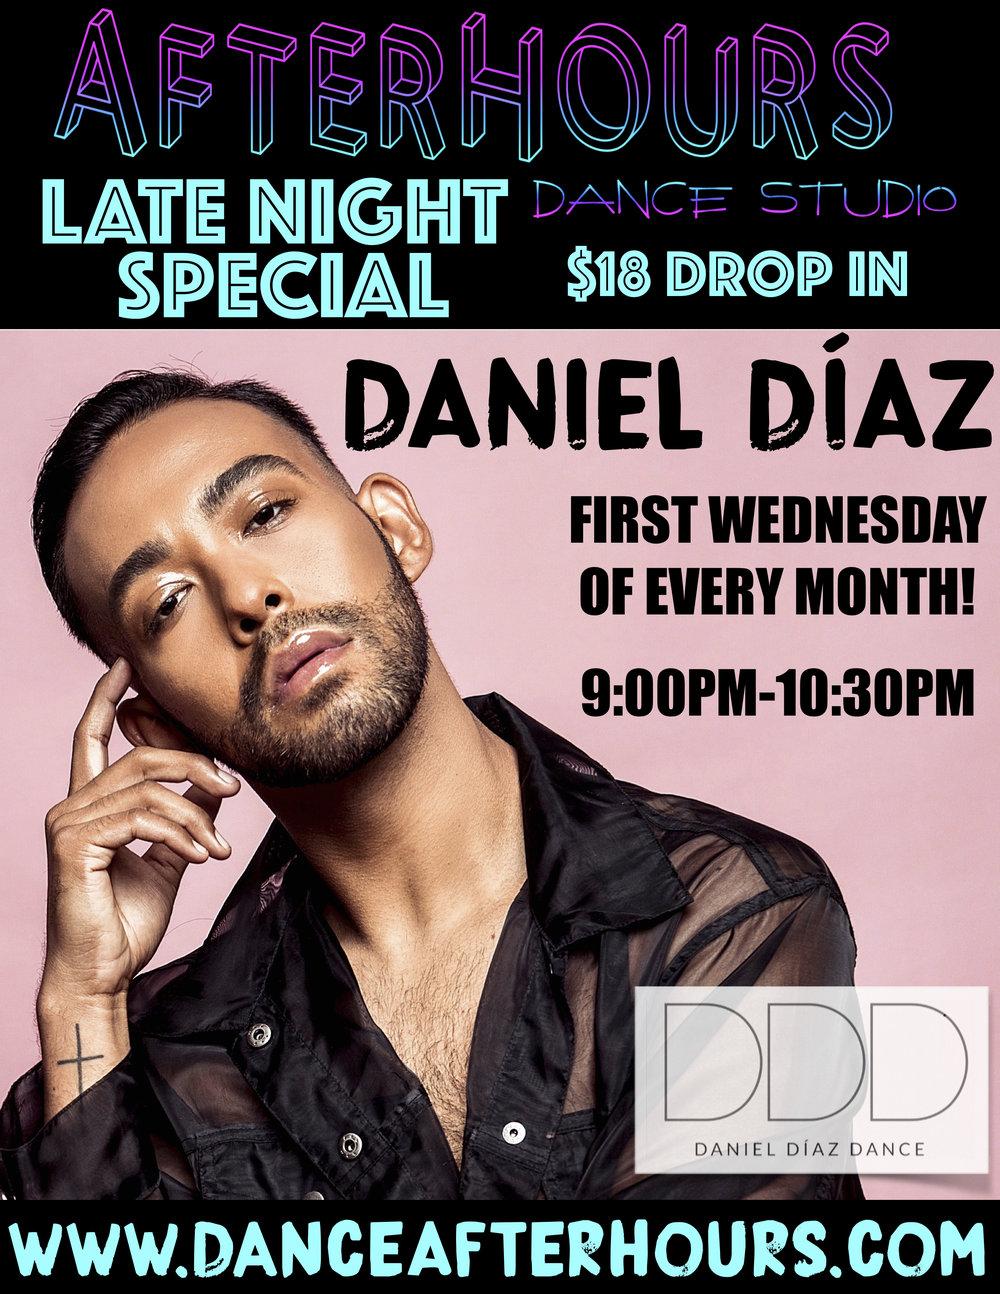 DannyDiaz Flyer.jpg